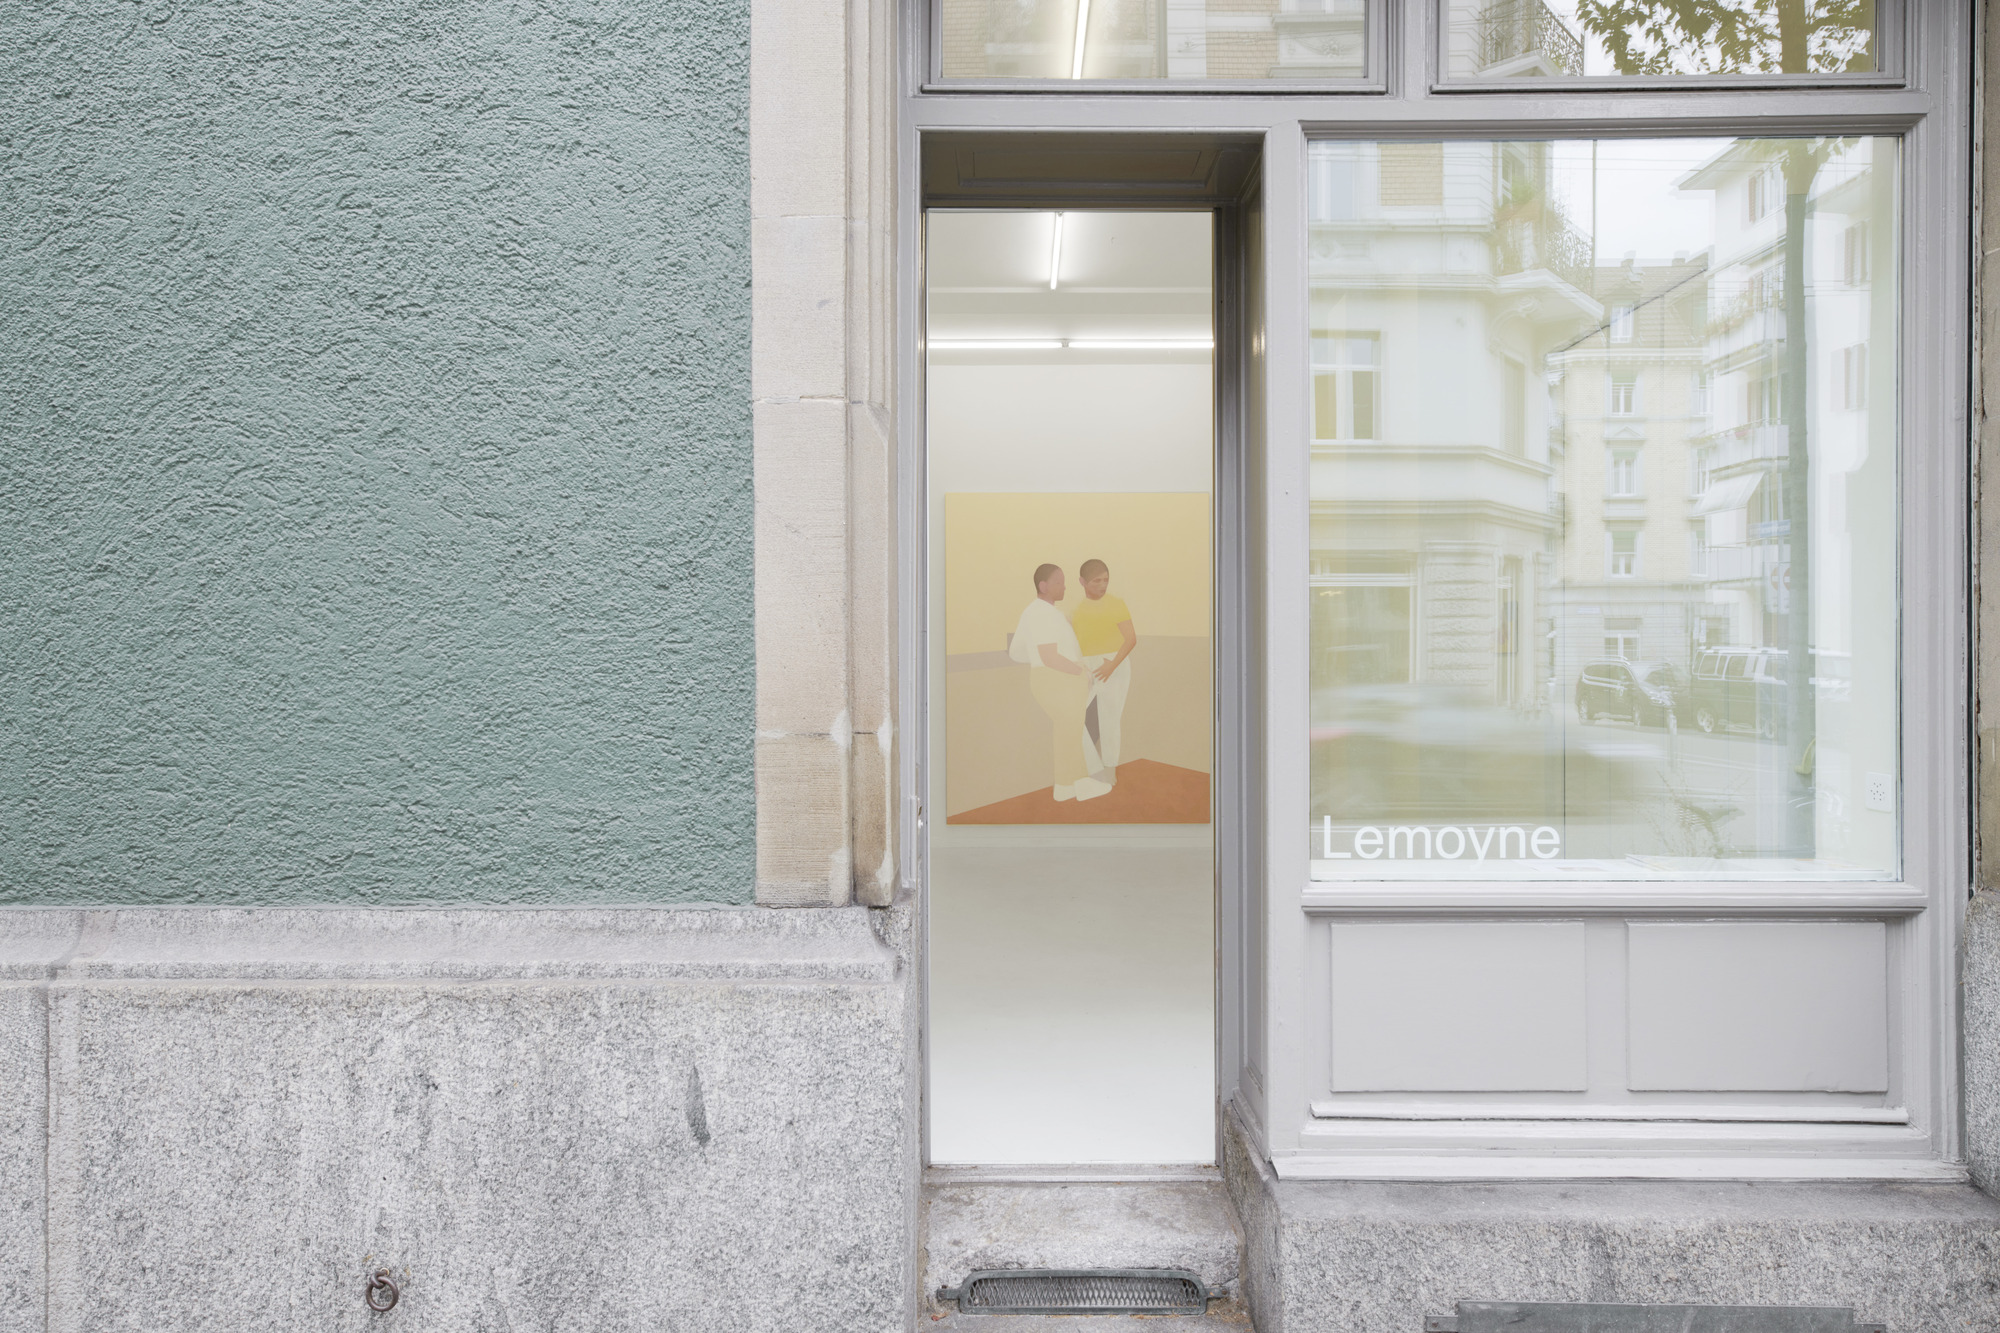 Manuel Stehli untitled, 2020, 240×190 cm, oil on canvas, Courtesy of the artist and Lemoyne